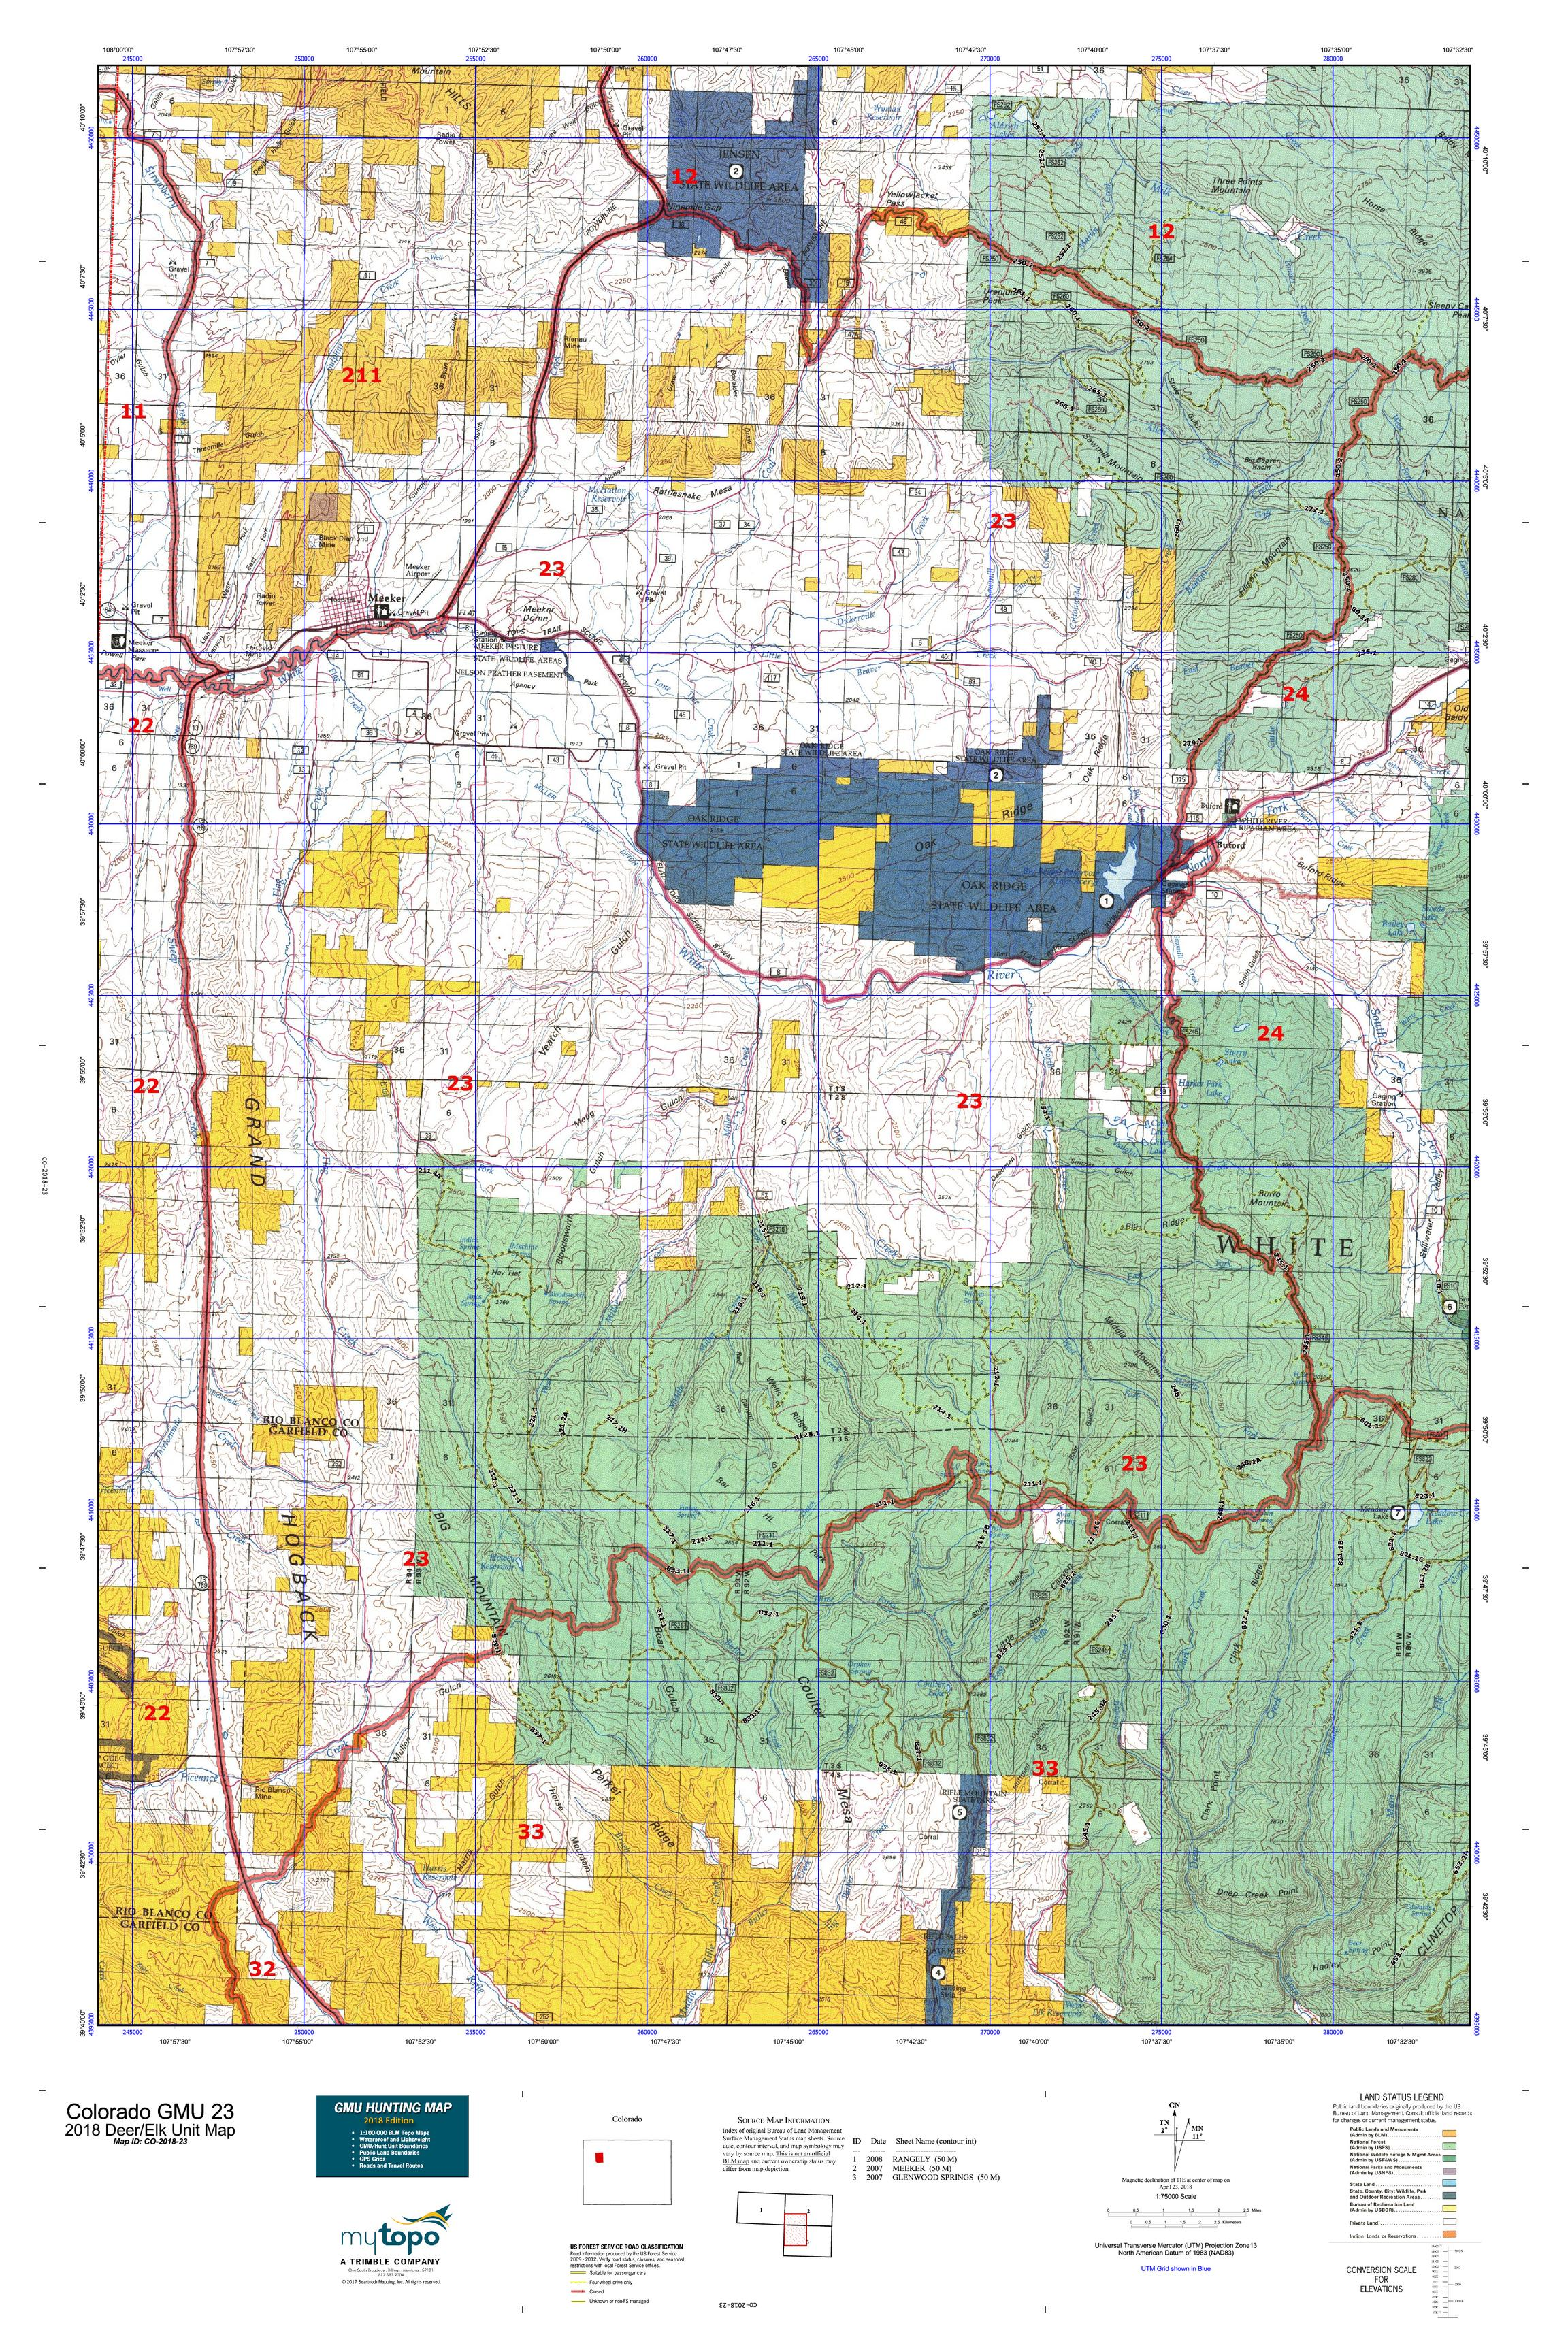 Colorado Gmu 301 Hunting Map eurostar map